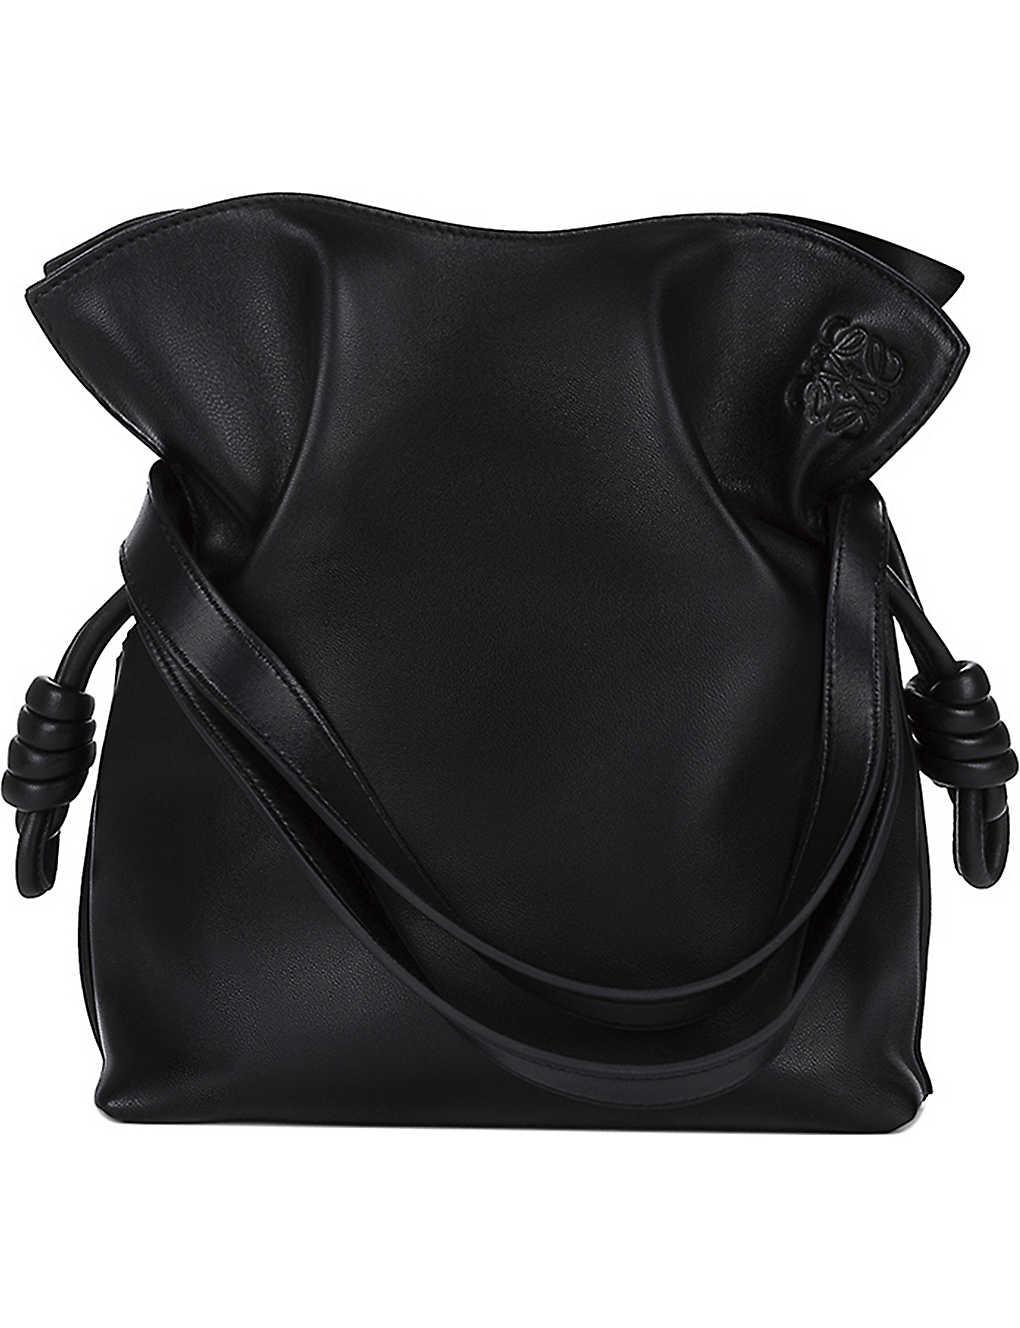 54a607a28b97 LOEWE - Flamenco knot small leather bag